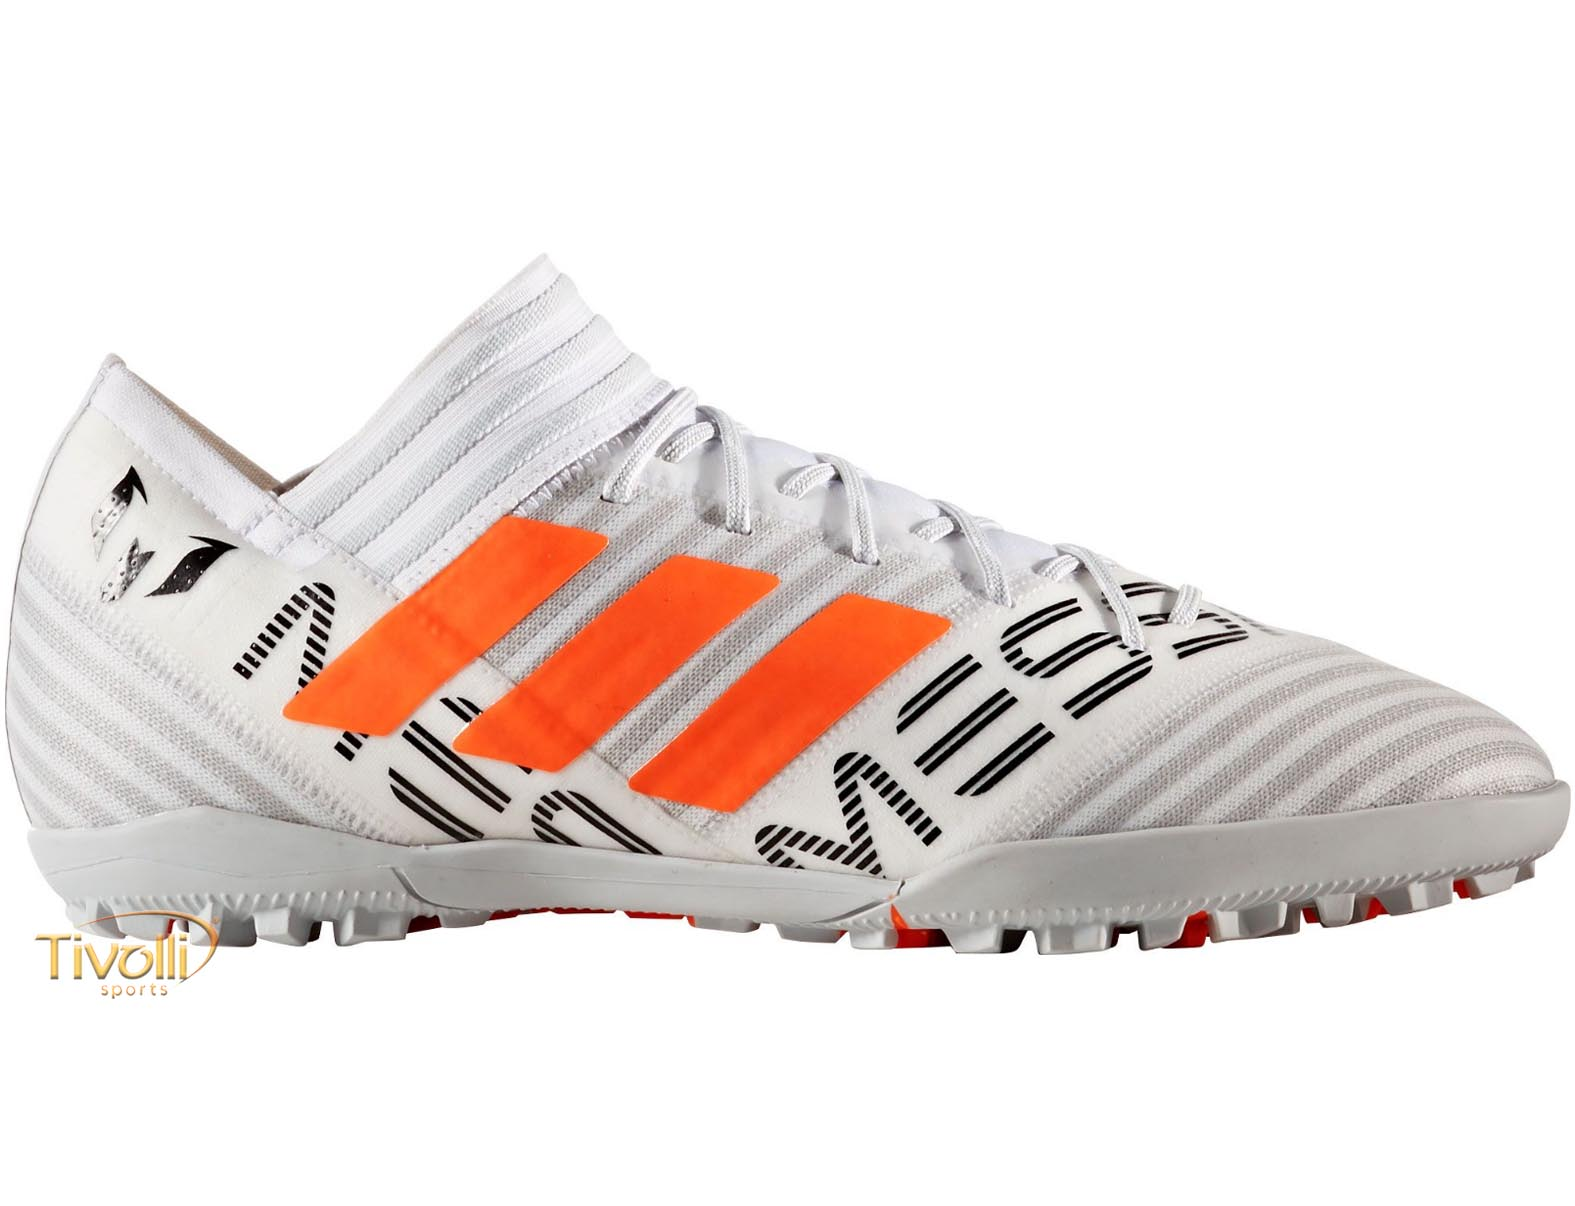 Chuteira Adidas Nemeziz Messi Tango 17.3 TF Society     f285a4d6fafcf